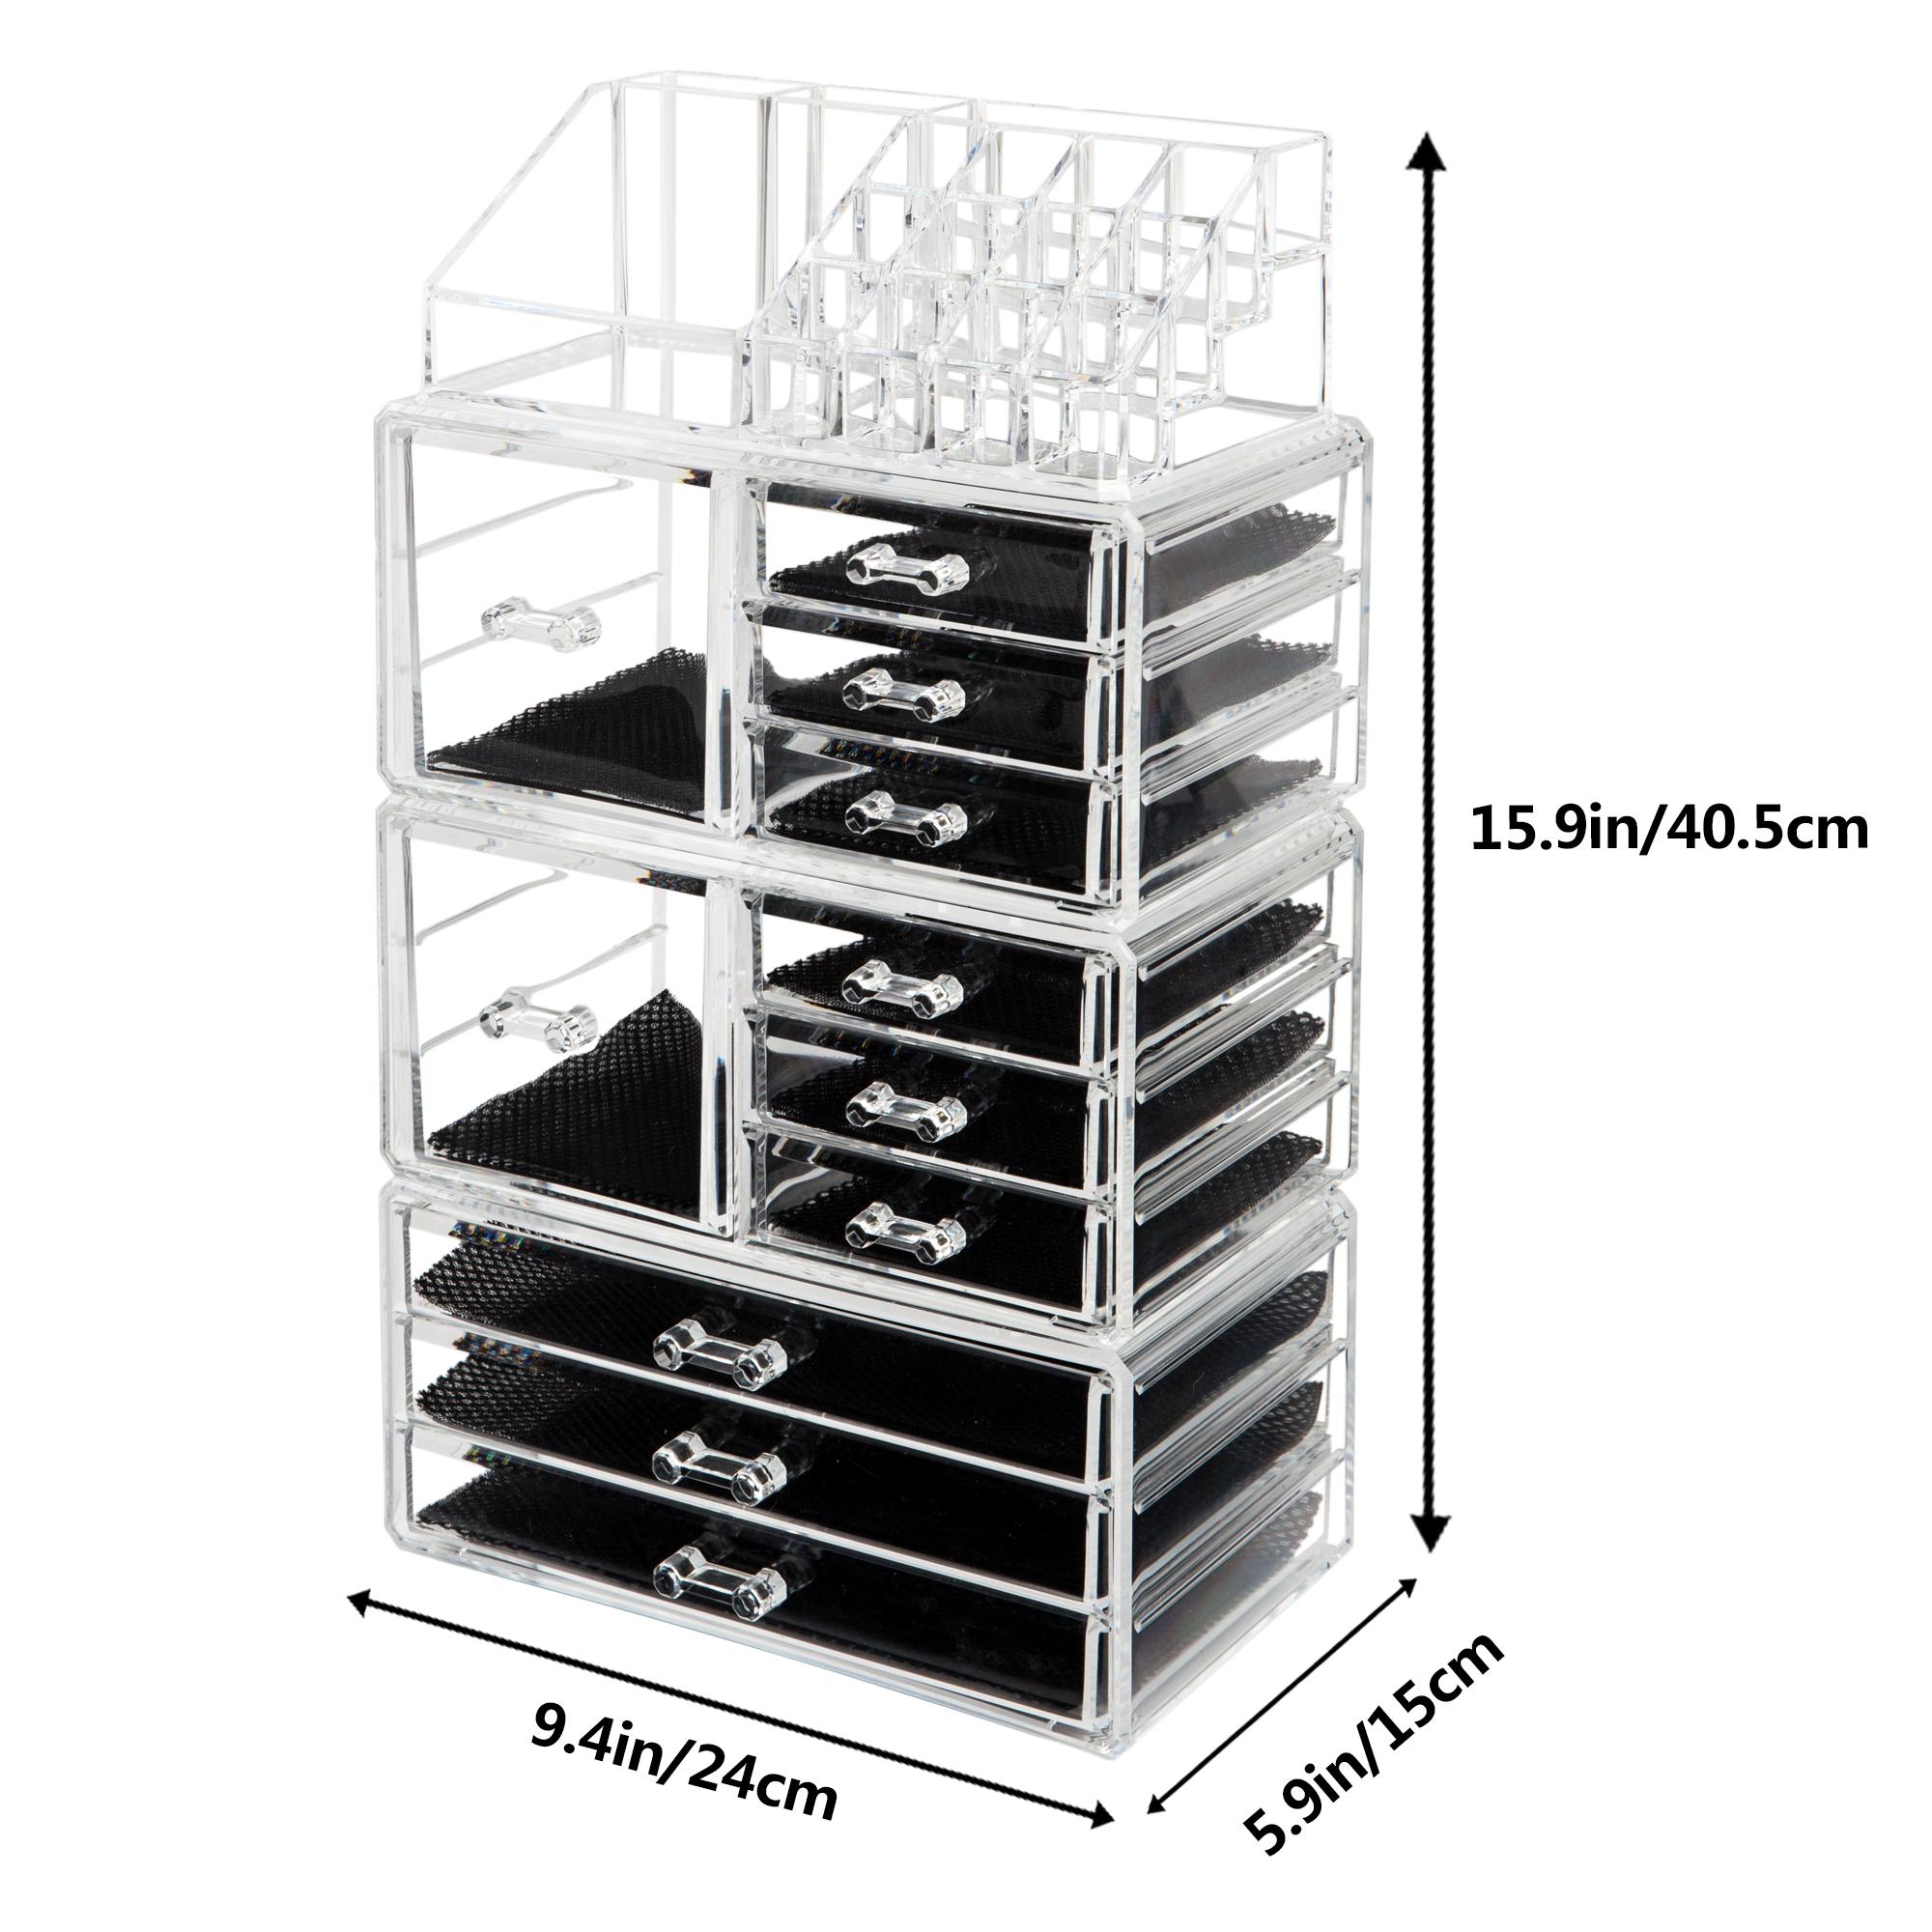 Zimtown 11 Drawers Clear Acrylic Tower Organizer Cosmetic Jewelry Luxury Storage Cabinet